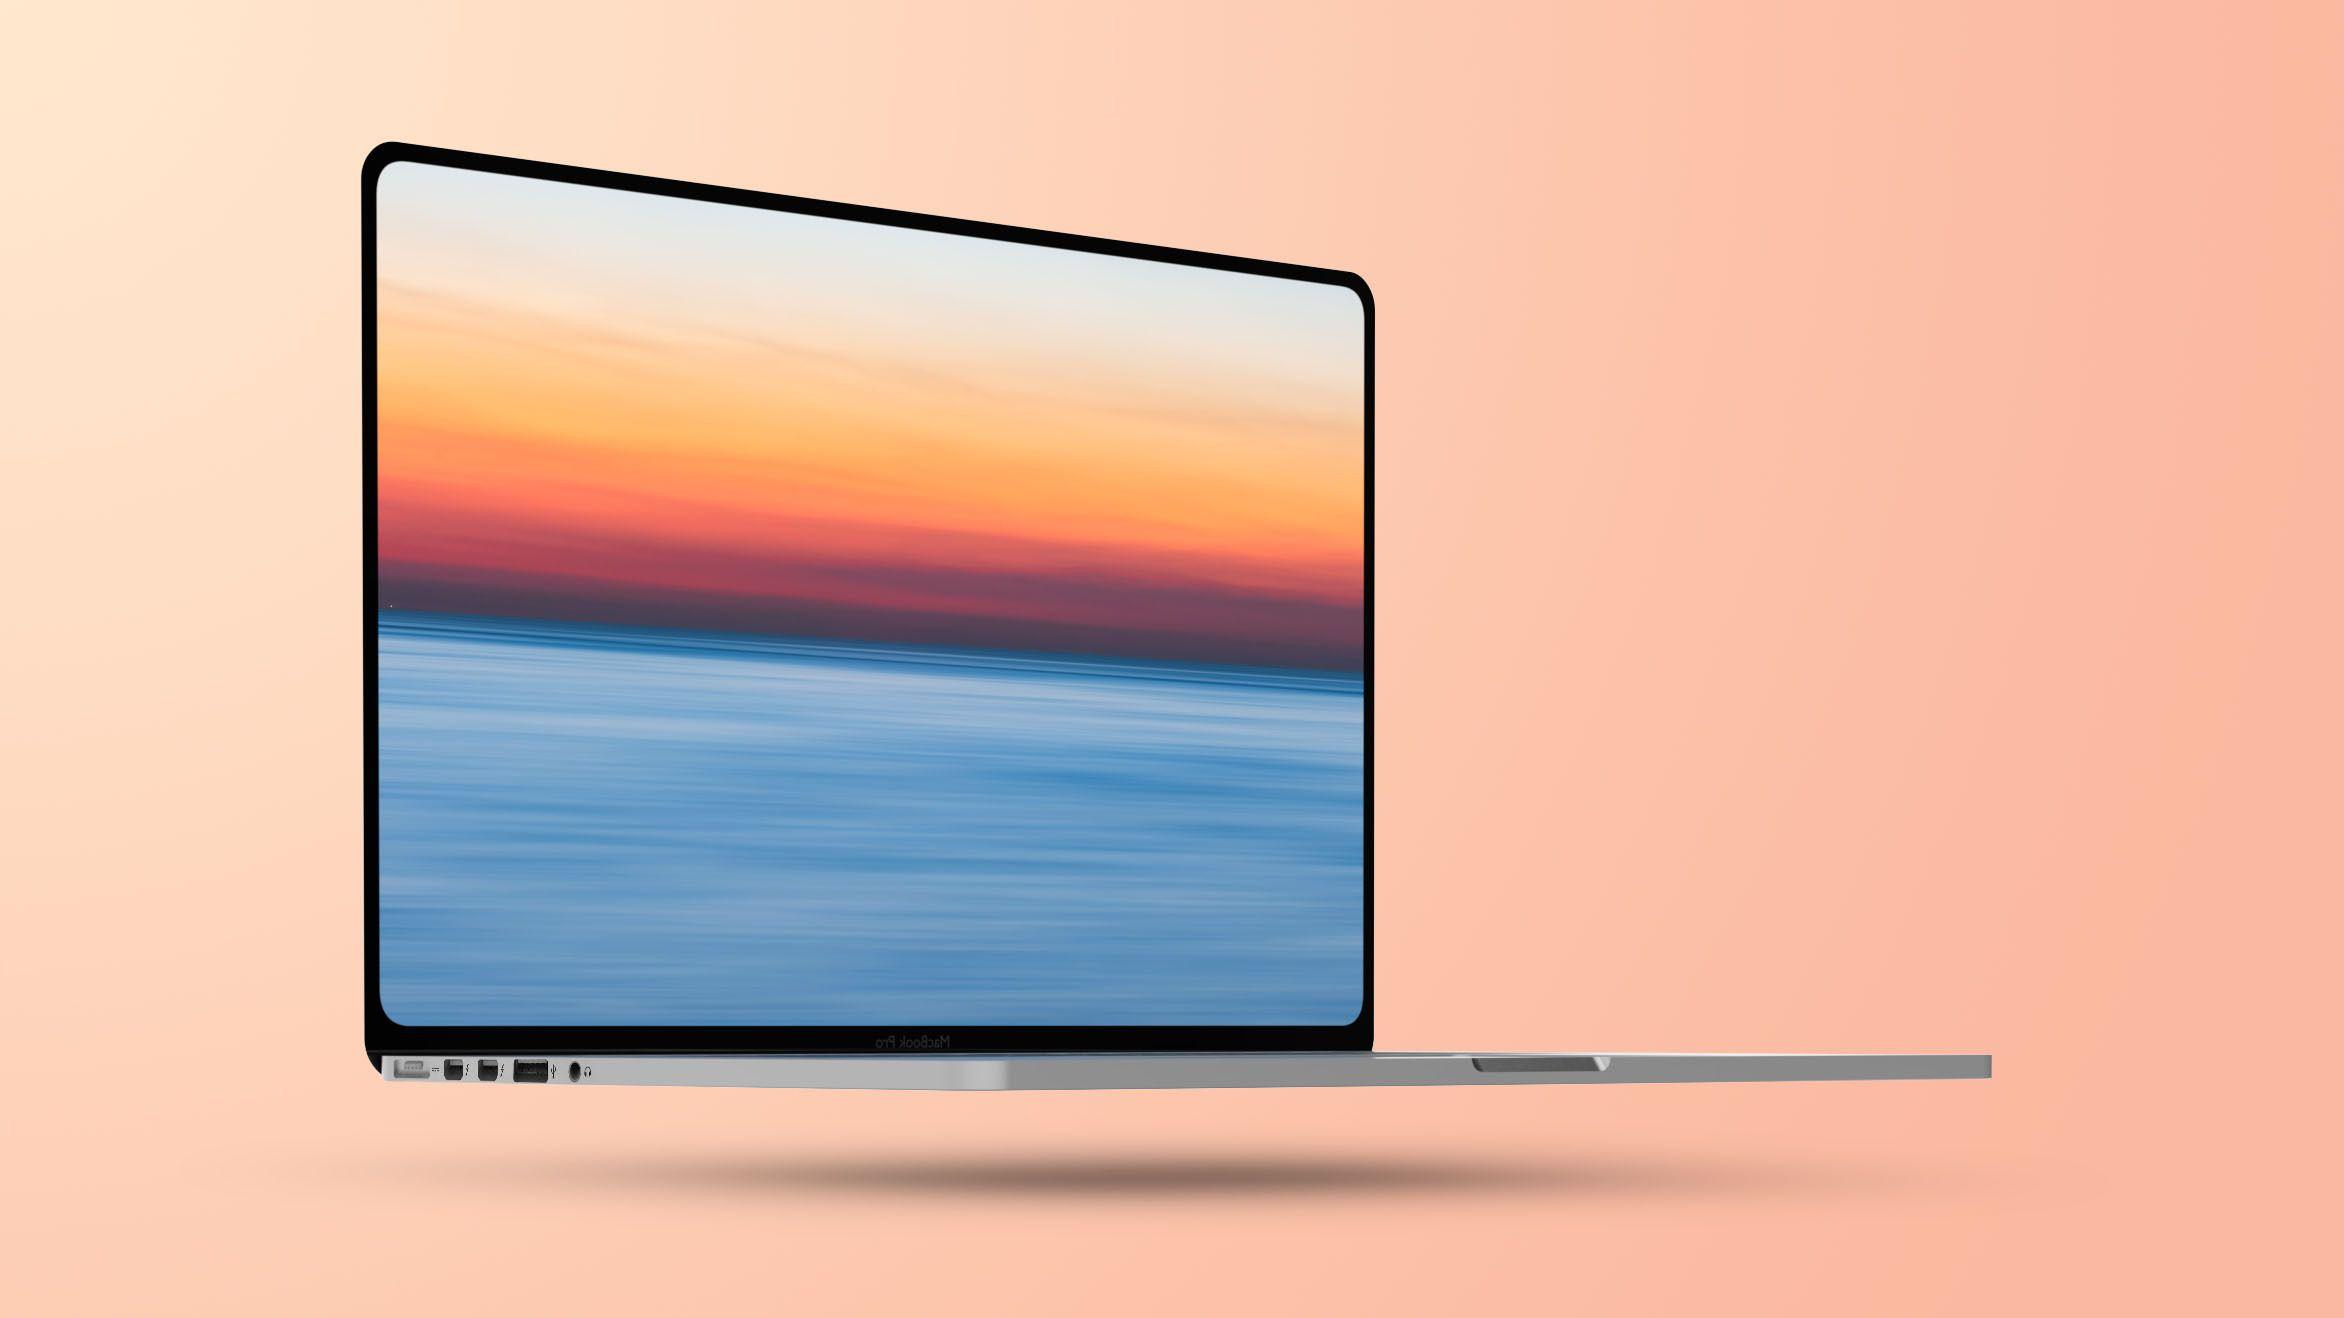 Min-Chi Kuo: MacBook Pro 2021 brings back HDMI and SD card reader TechRechard